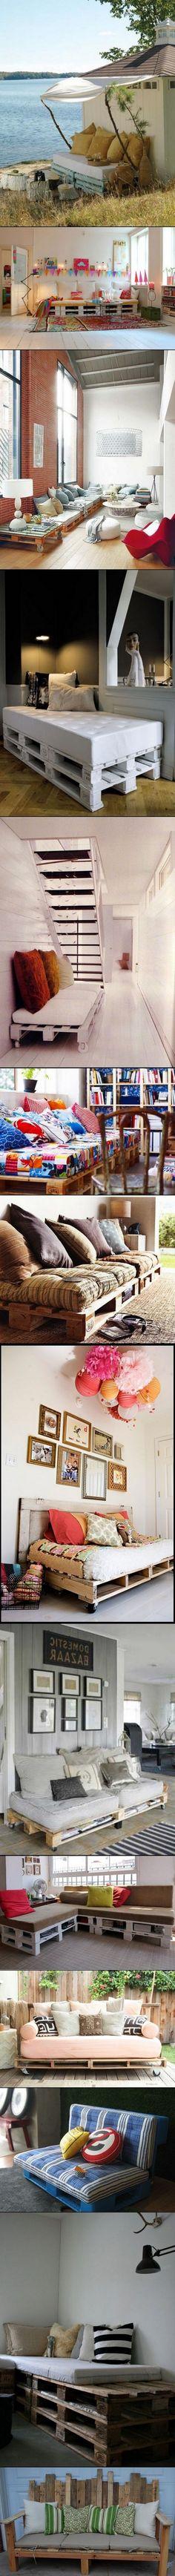 DIY Palette Home Decor